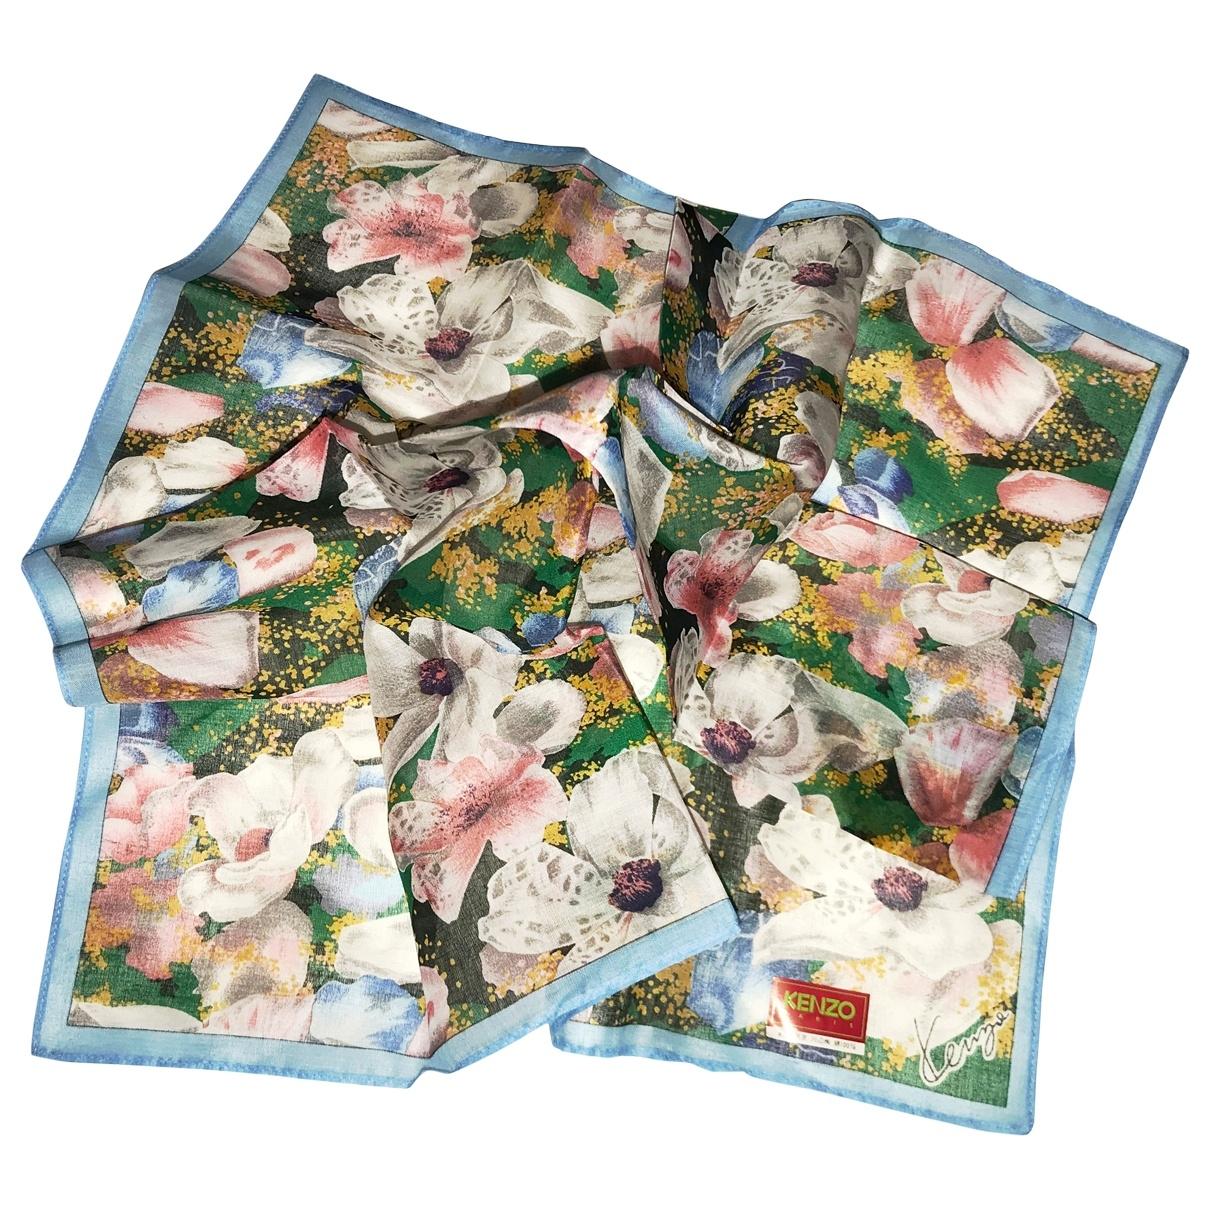 Kenzo \N Turquoise Linen scarf for Women \N